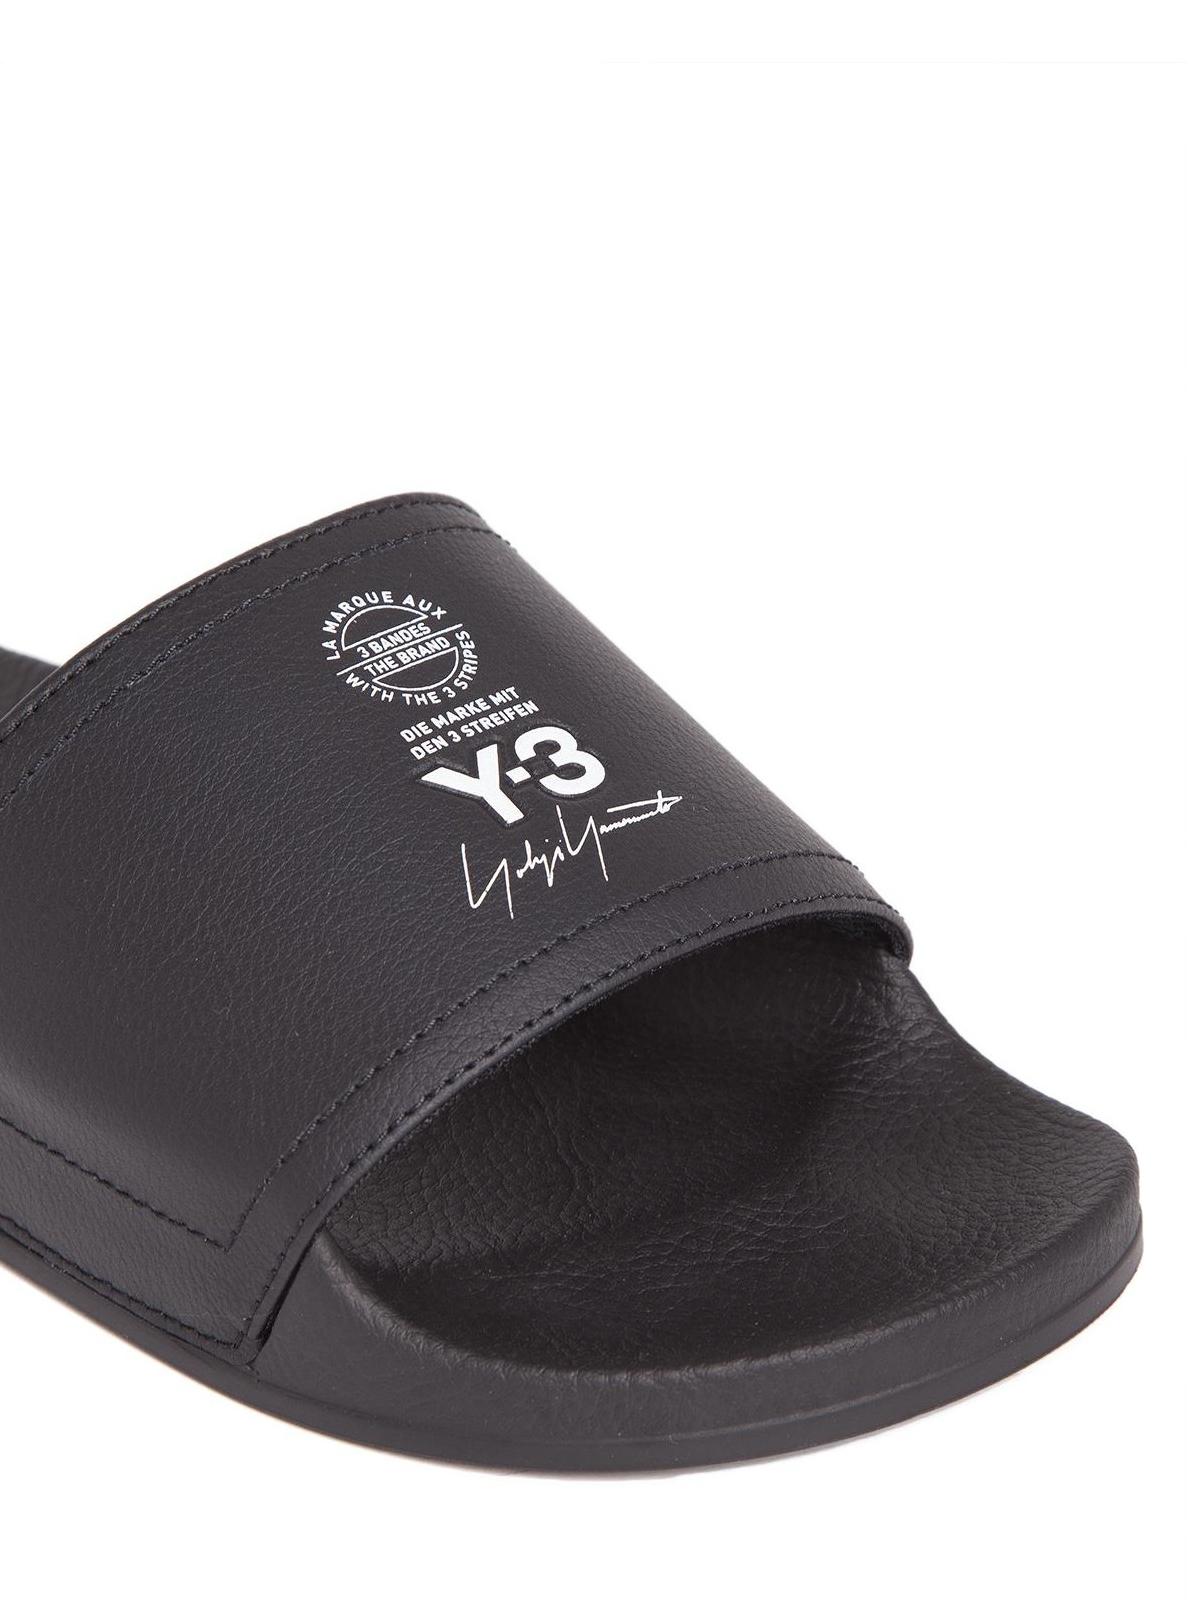 e5cbeb8e00a Adidas Y-3 - Sandalias - Negro - Sandalias - AC7525ADILETTECBLACK